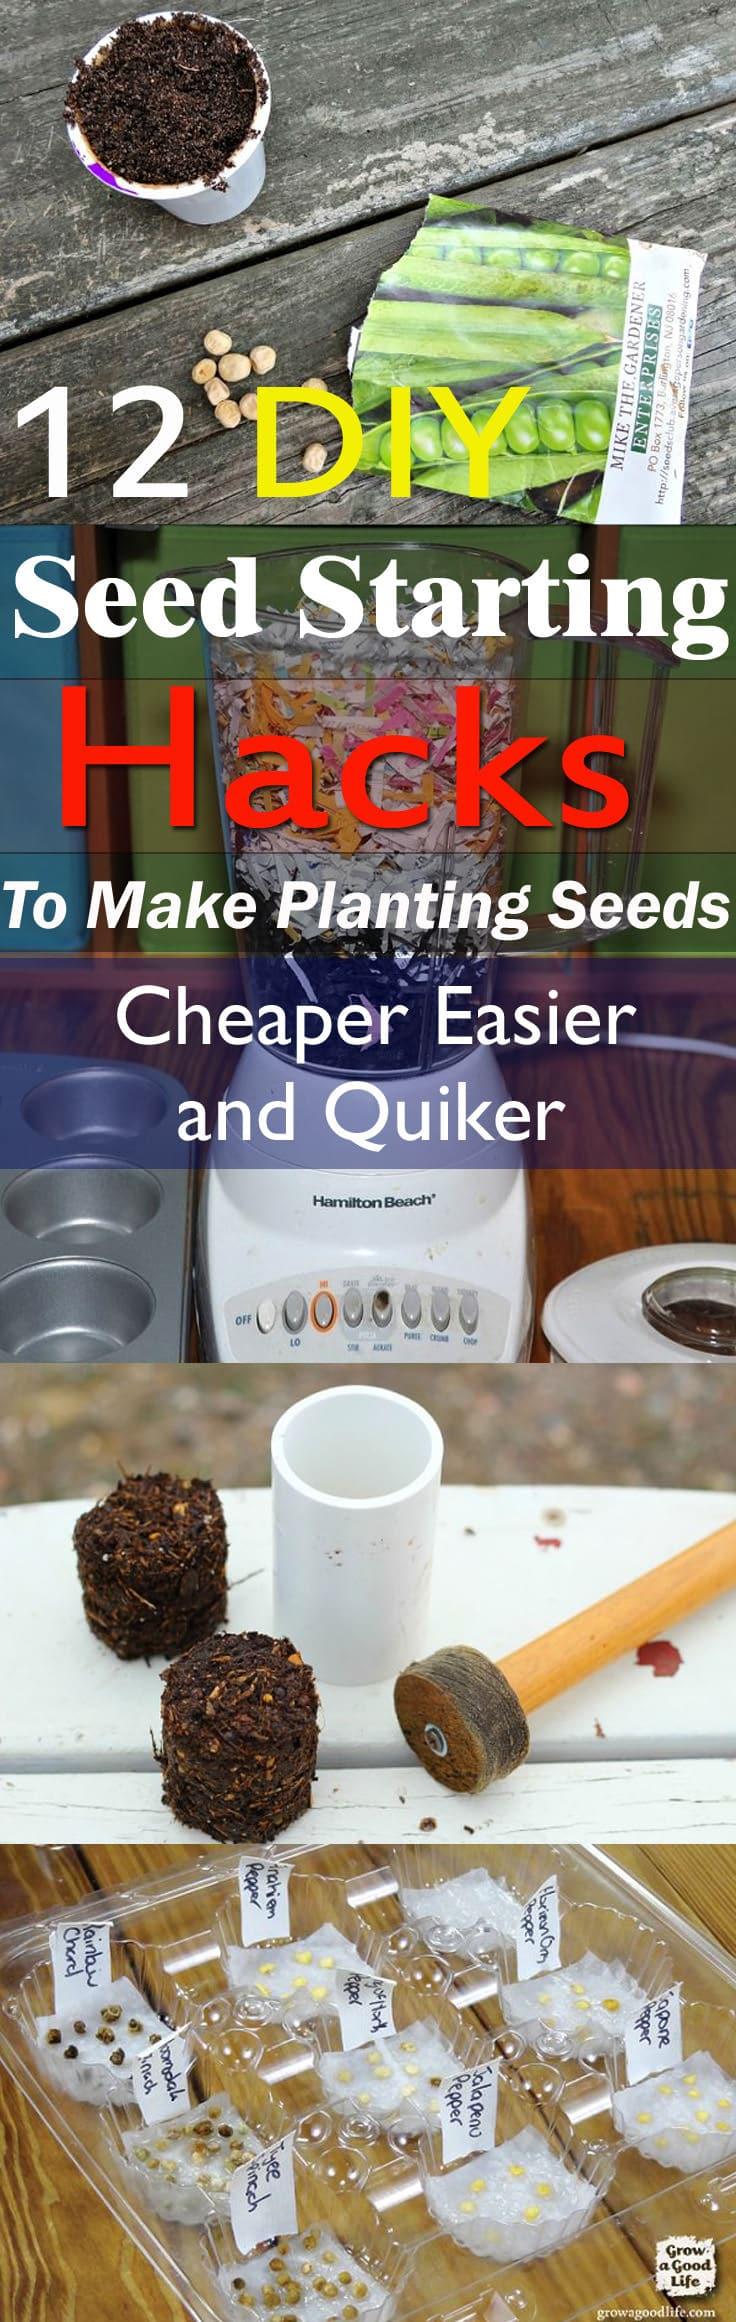 12 Diy Seed Starting Hacks To Make Planting Seeds Cheaper